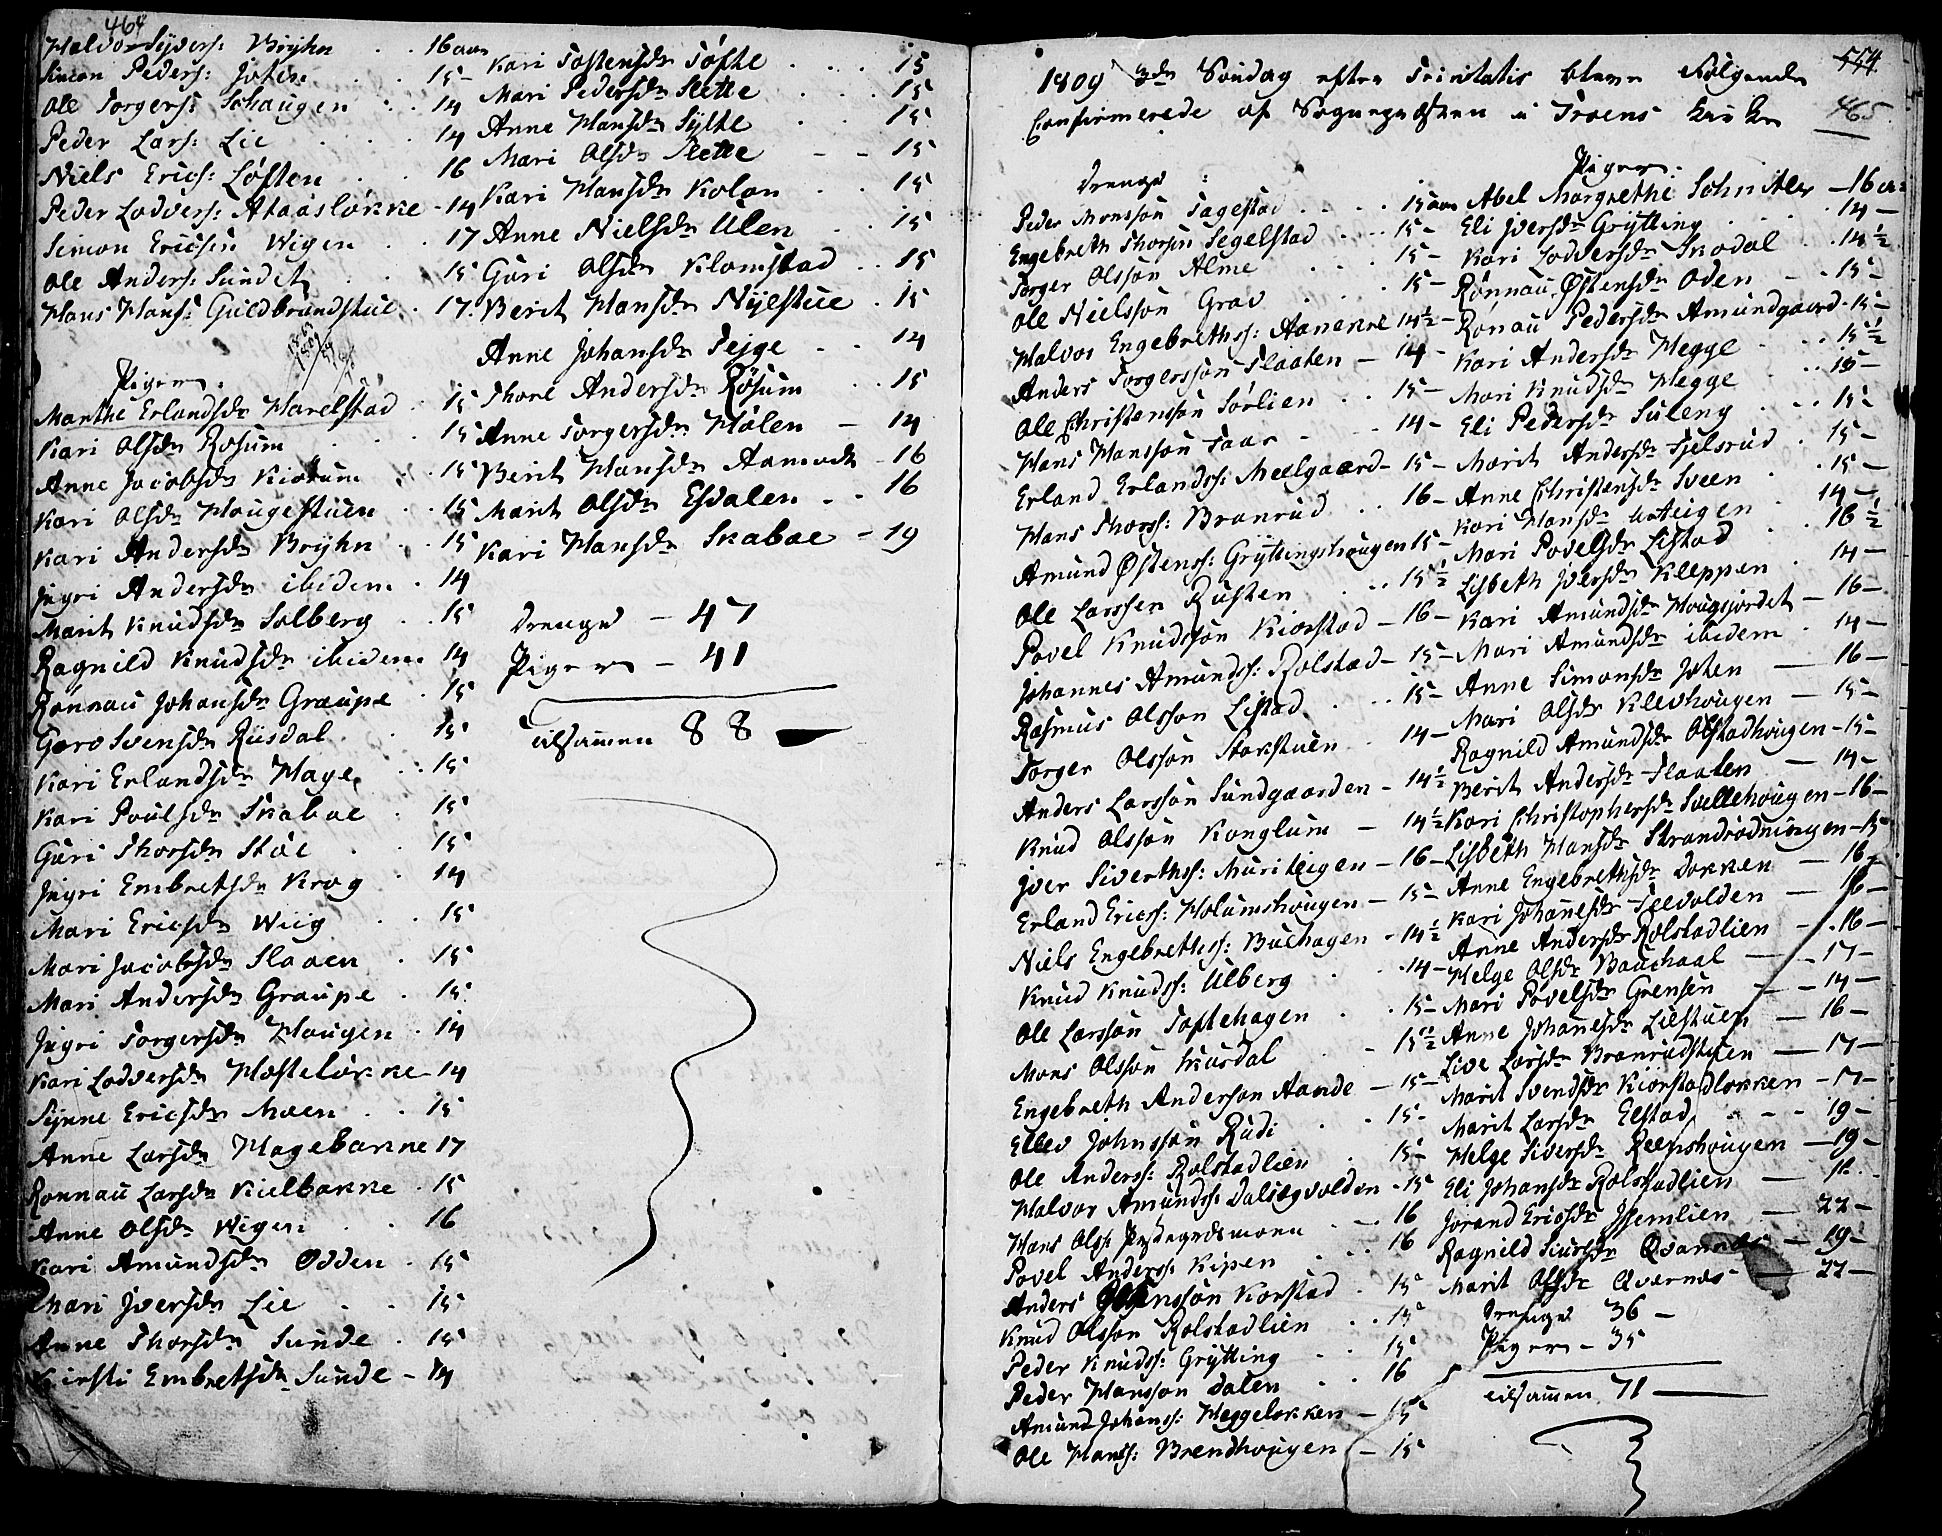 SAH, Fron prestekontor, H/Ha/Haa/L0001: Ministerialbok nr. 1, 1799-1816, s. 464-465